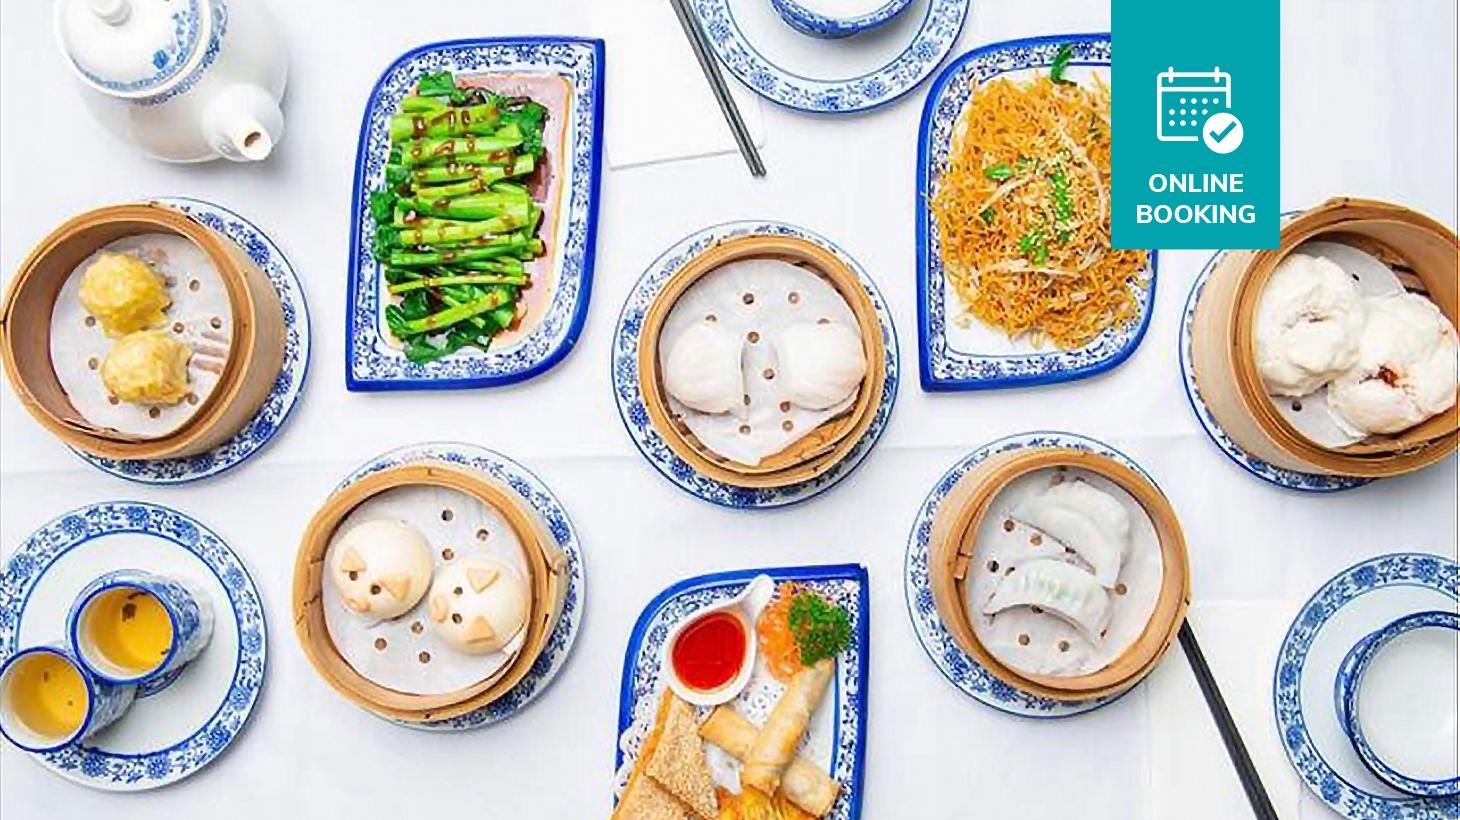 Ten yum cha plates  including prawn dumplings, chicken dim sum, barbecue pork buns, panda egg custard buns and more